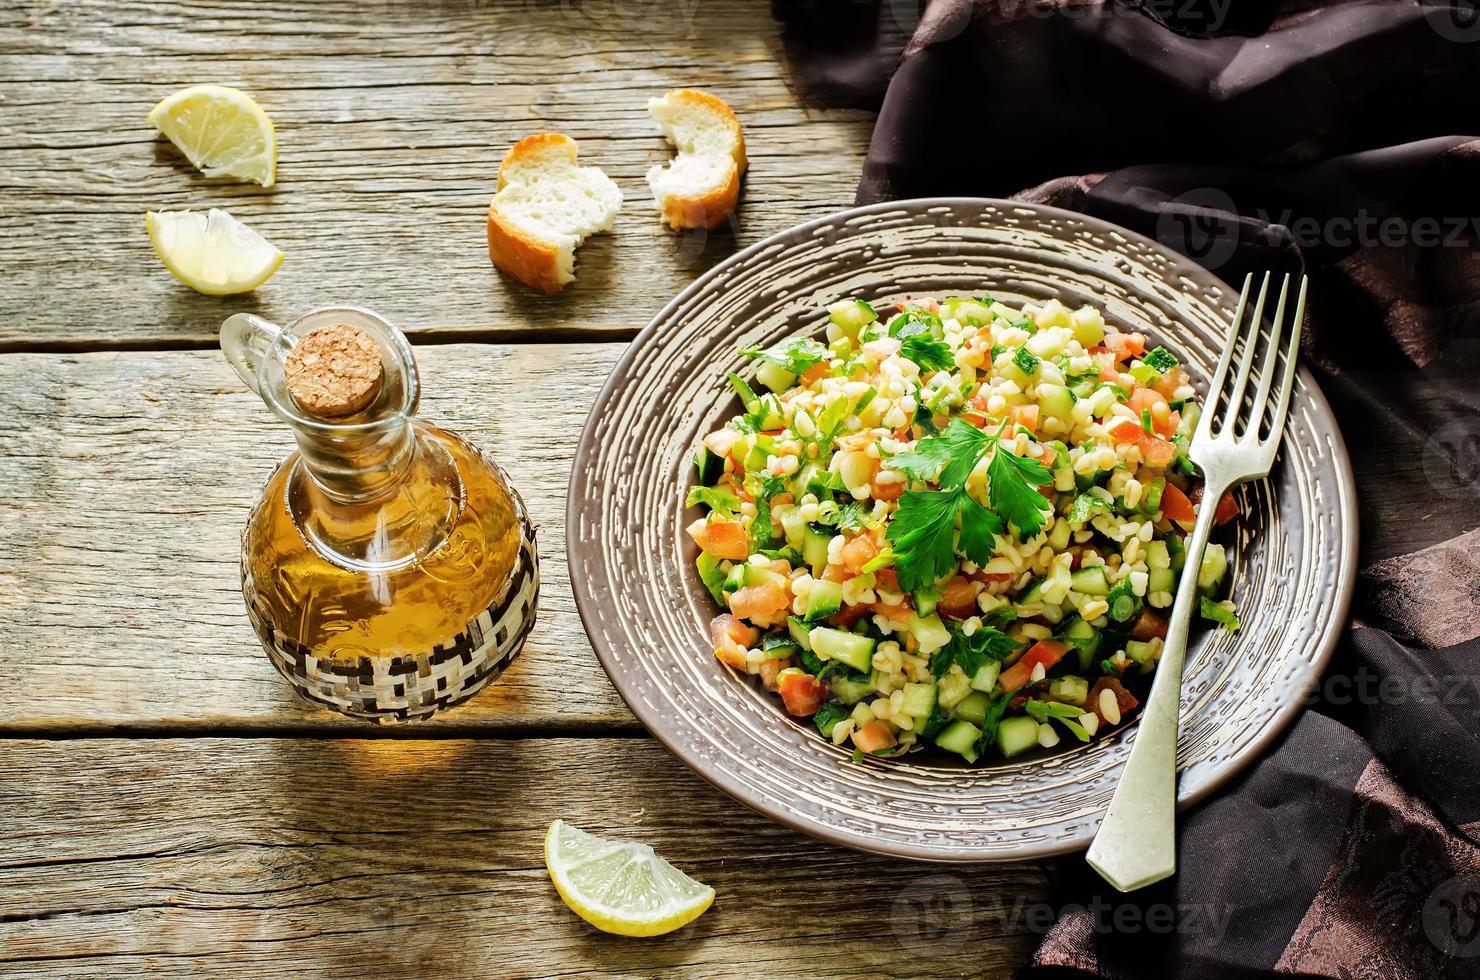 Salat mit Bulgur und Gemüse, Taboulé foto